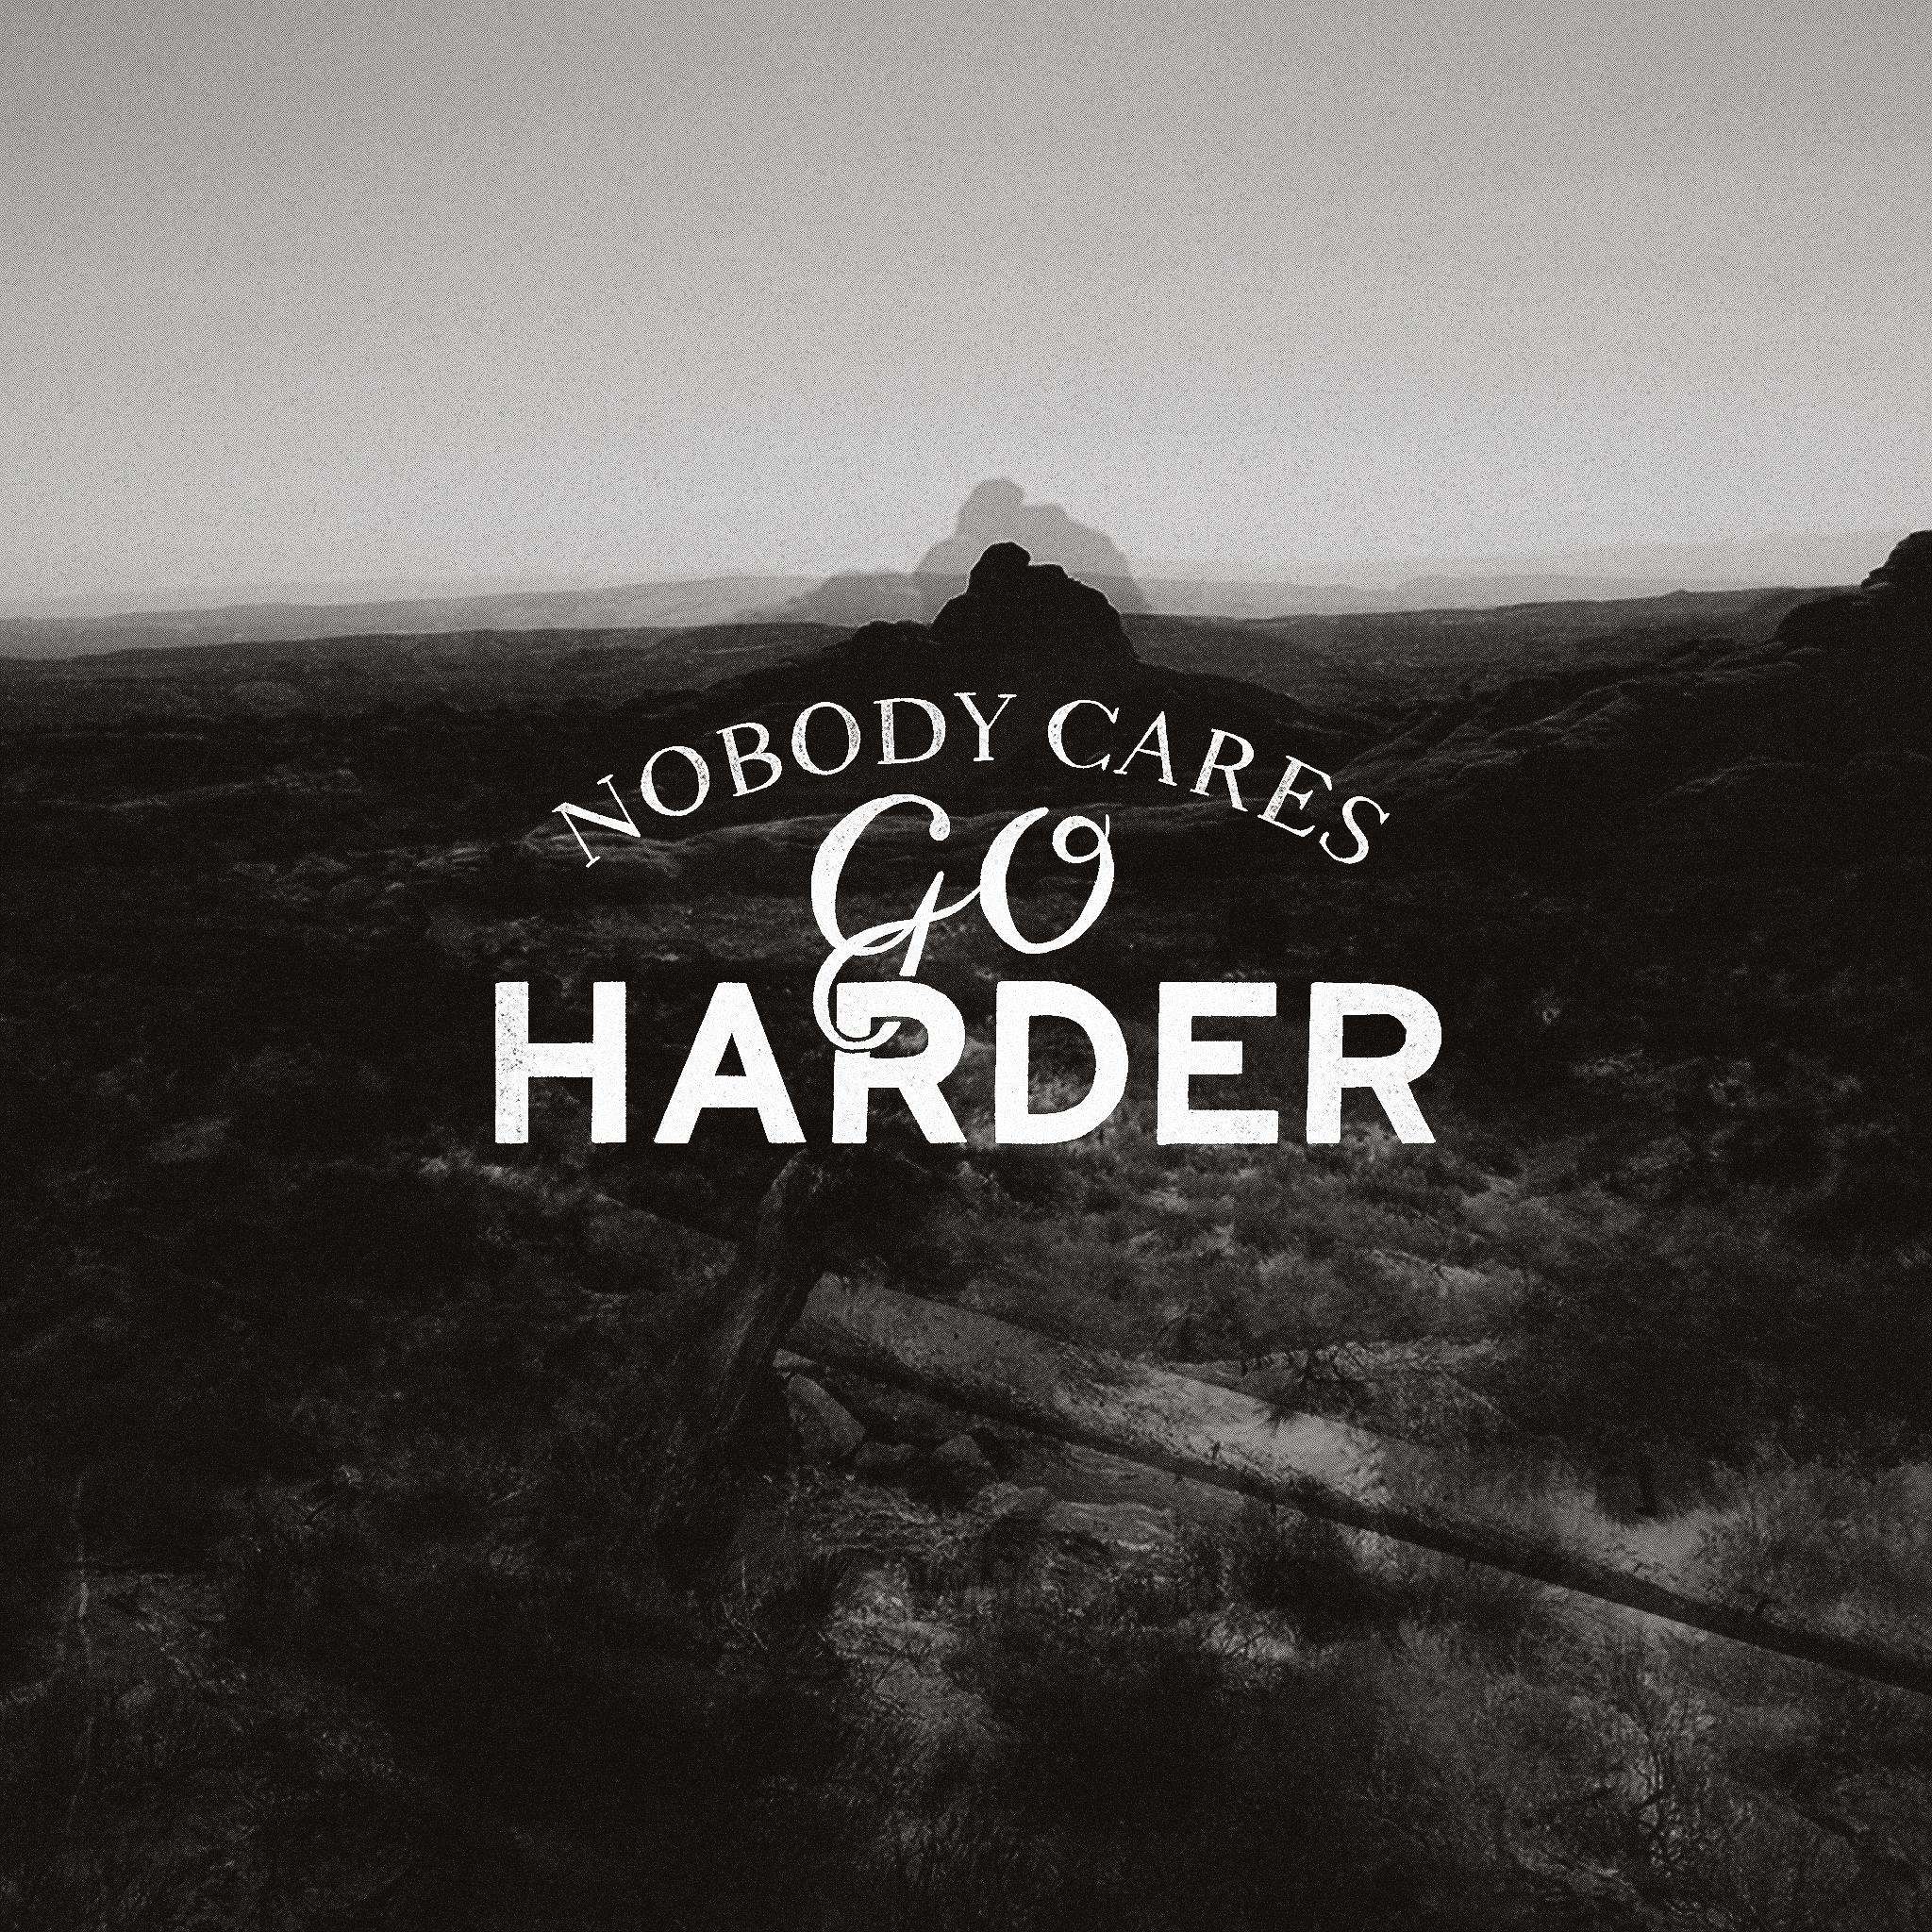 Go Harder iPad by Fudgegraphics